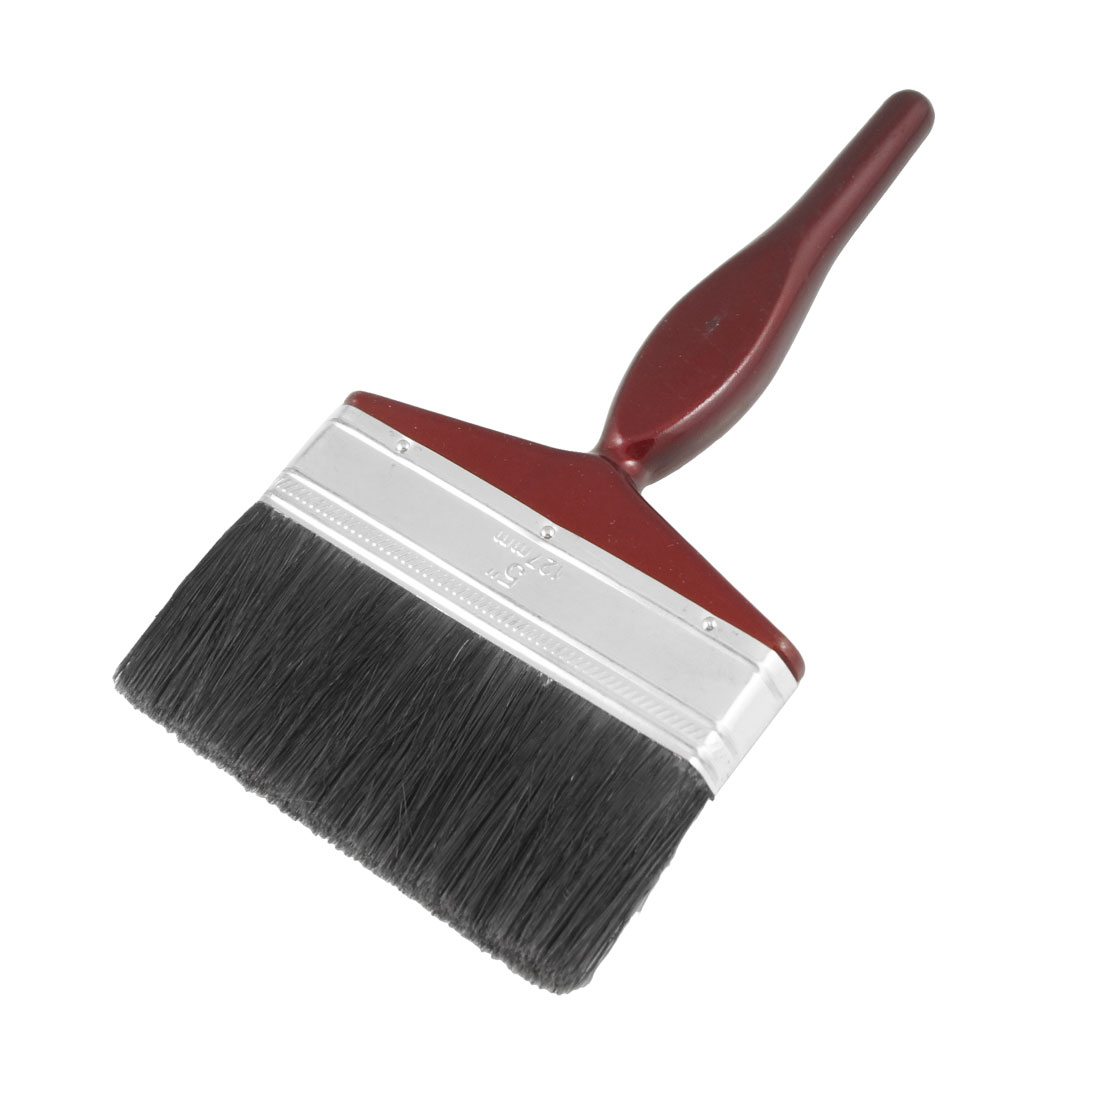 "Nylon Bristle Wooden Handle Paint Brush Painting Tool Dark Red 5"" Width"